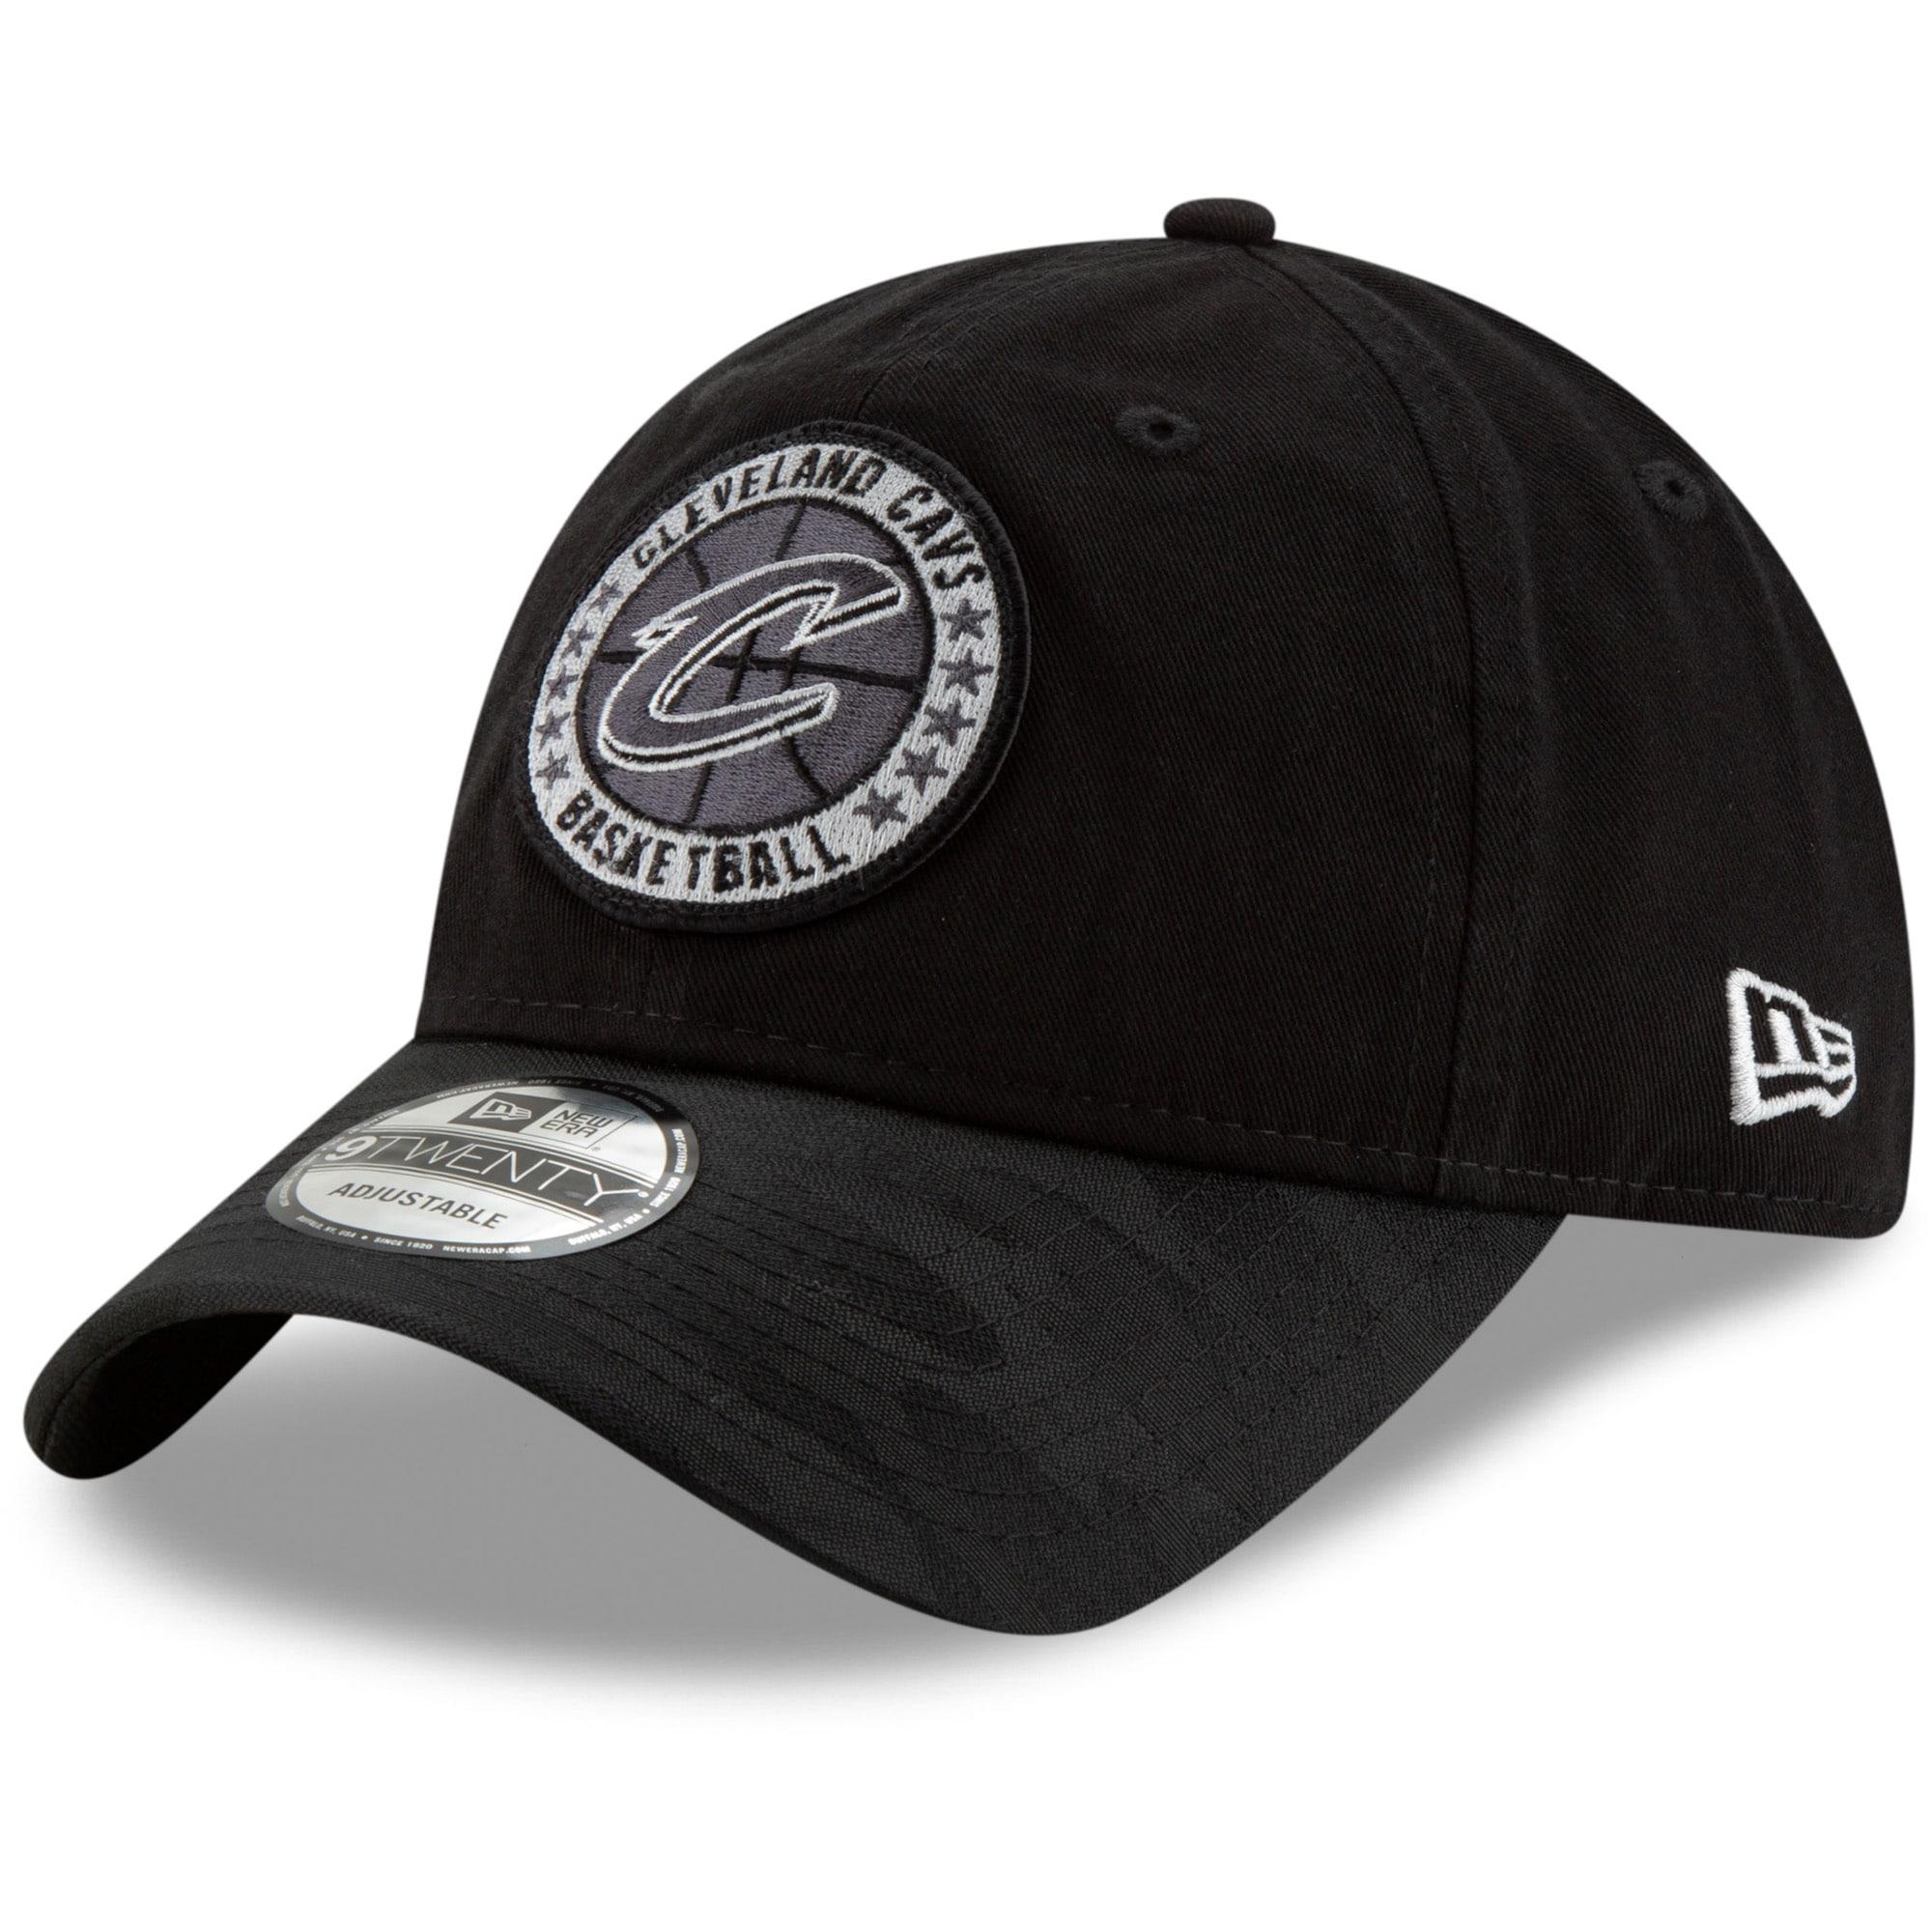 Cleveland Cavaliers New Era 2018 Tip Off Series 9TWENTY Adjustable Hat - Black